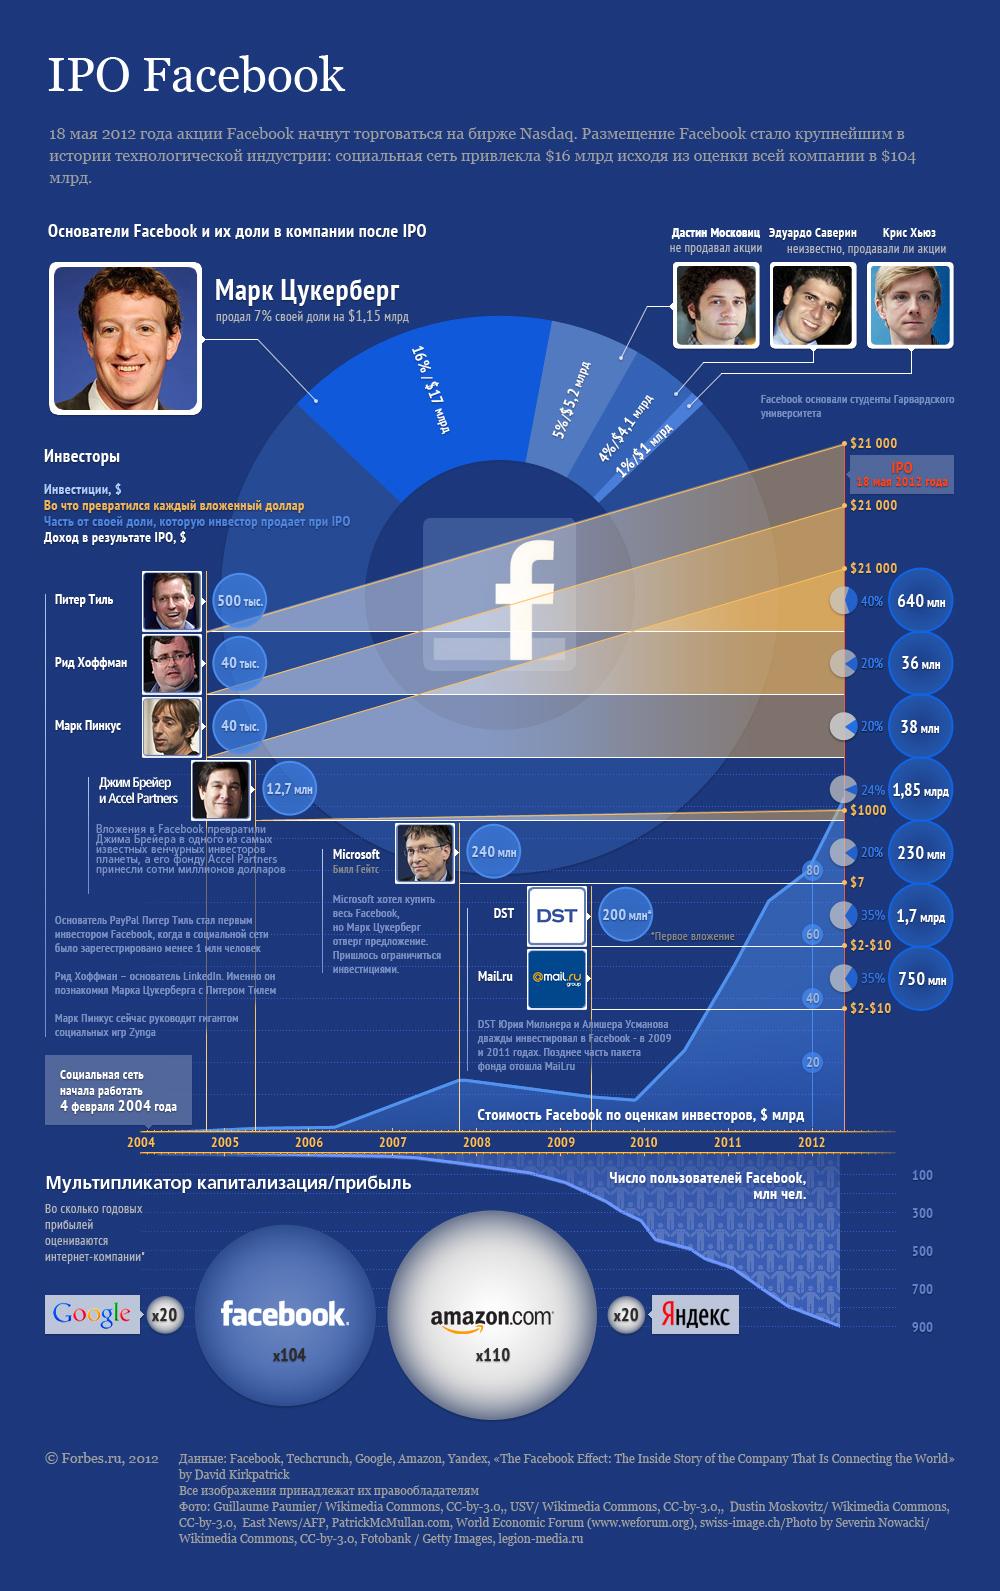 Инфографика от Forbes